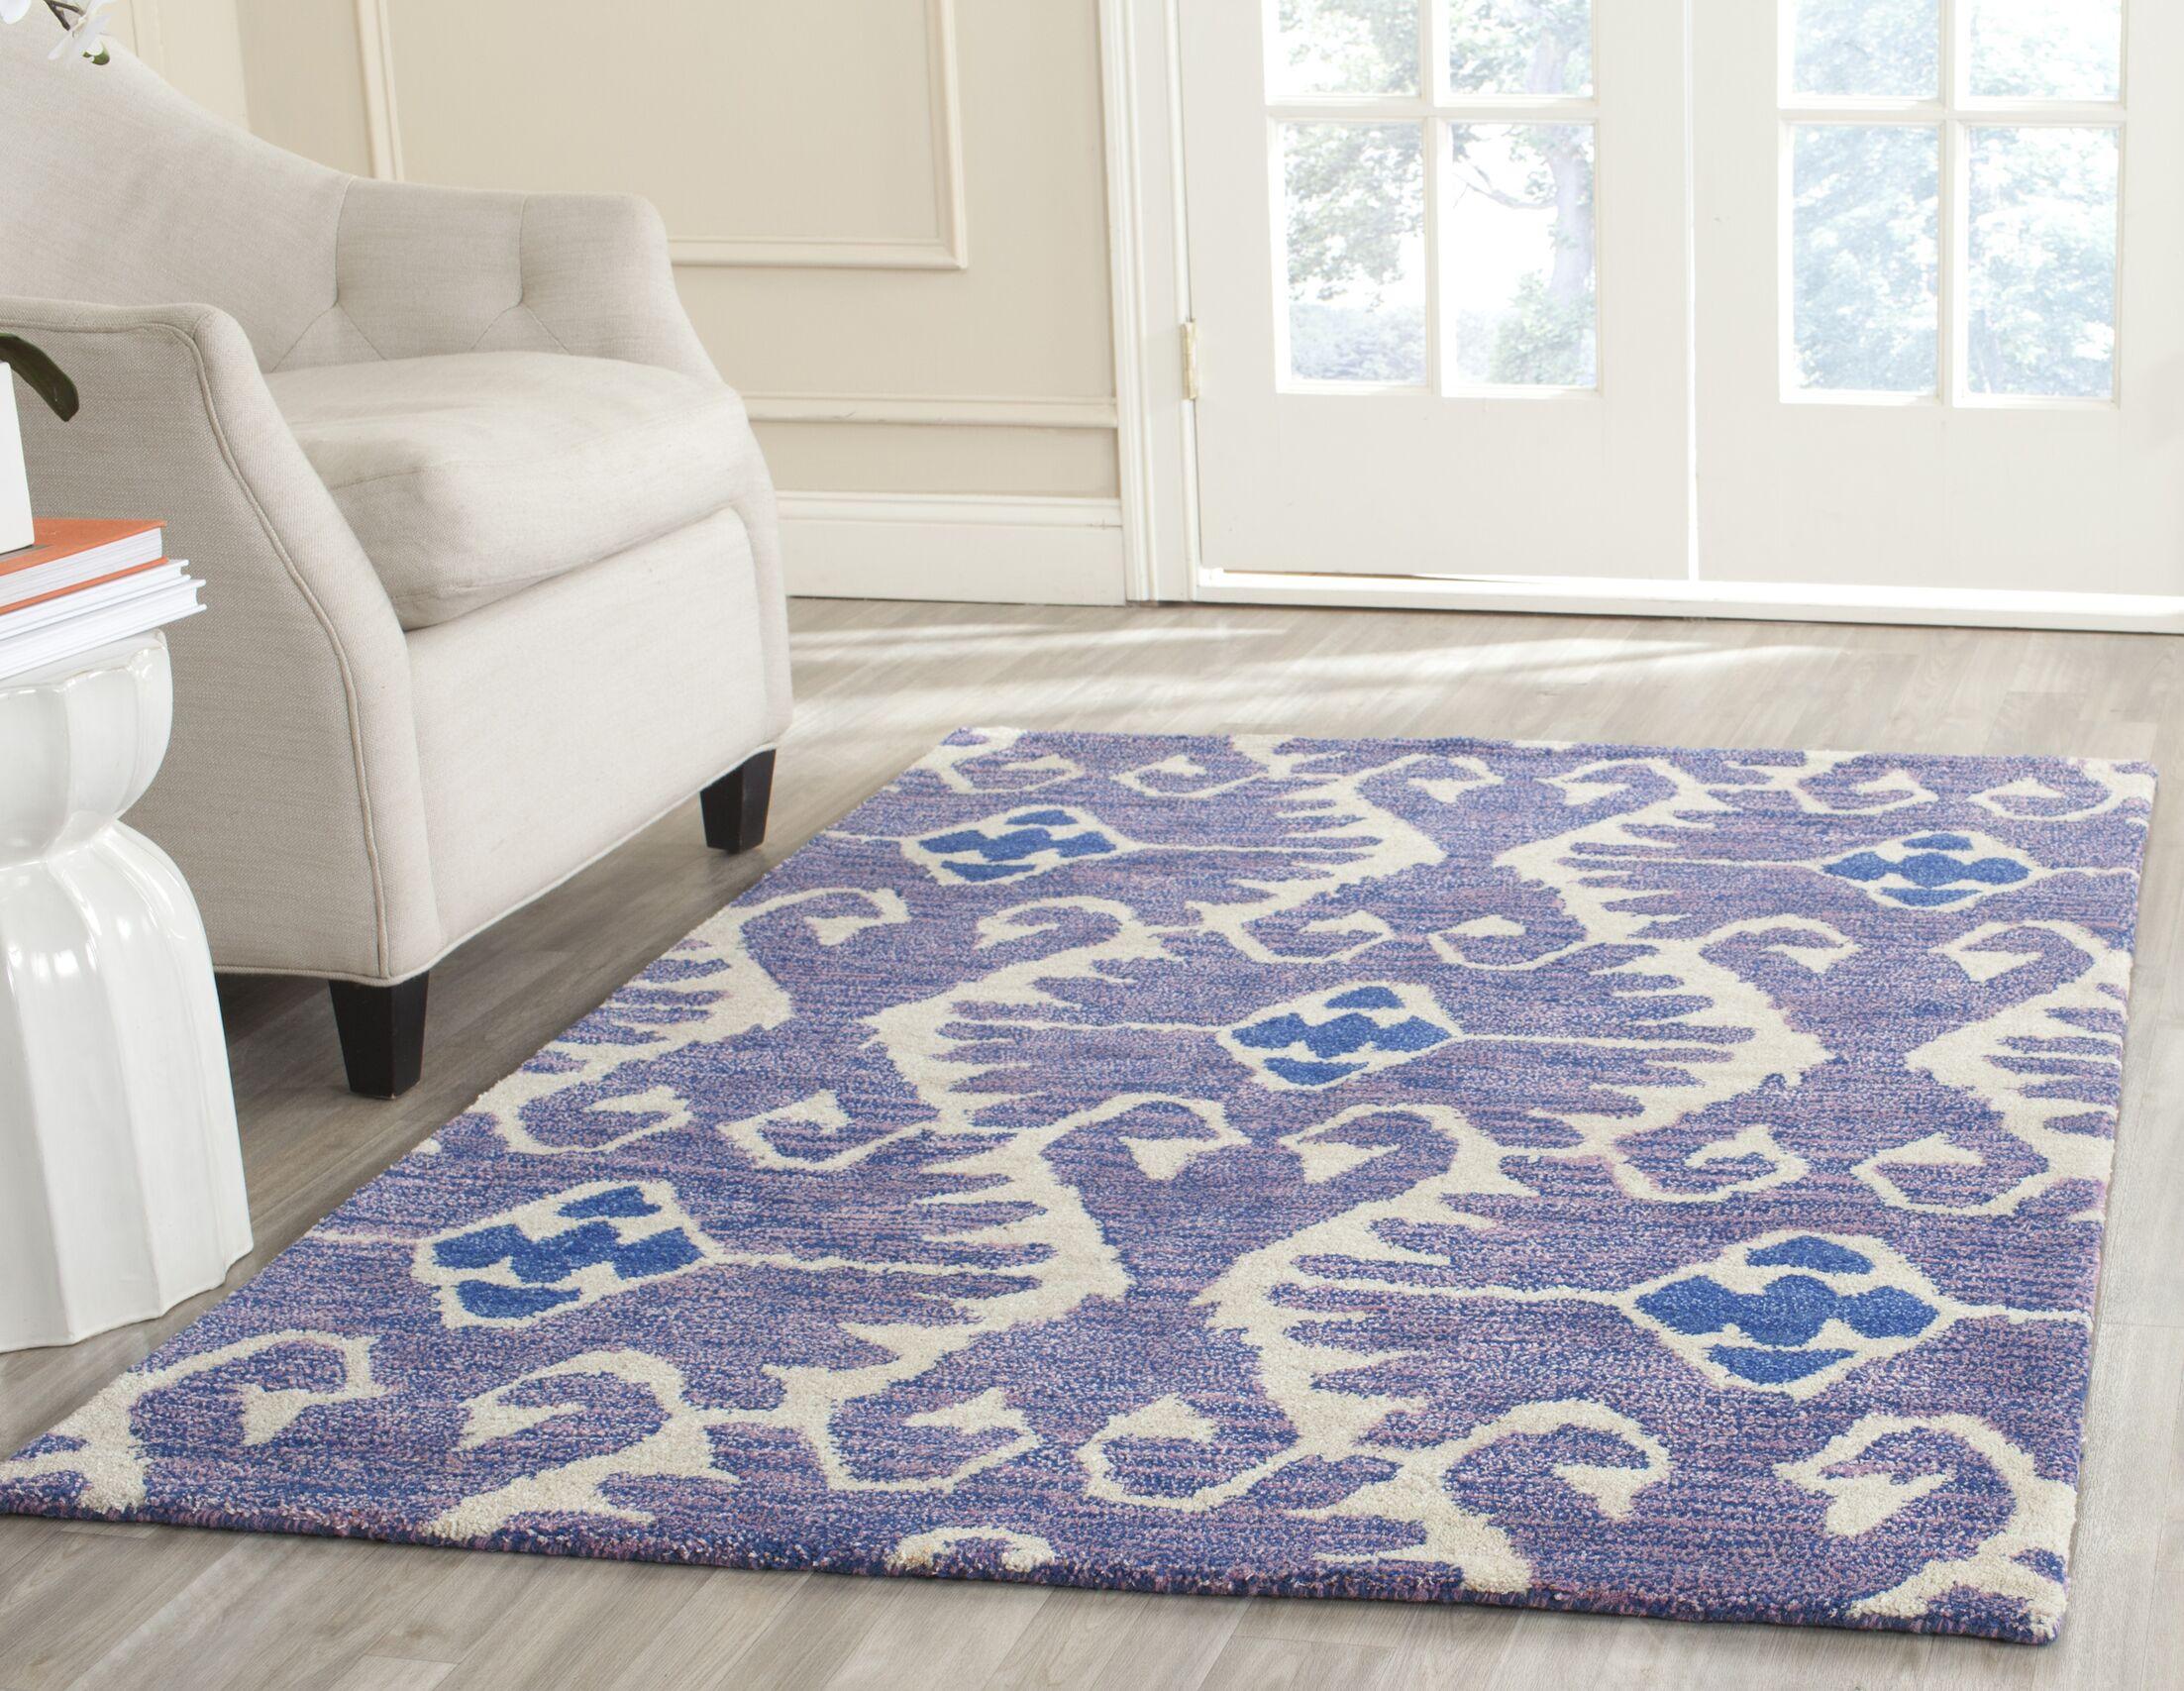 Kouerga Hand-Tufted Wool Lavender/Ivory Area Rug Rug Size: Rectangle 8'9